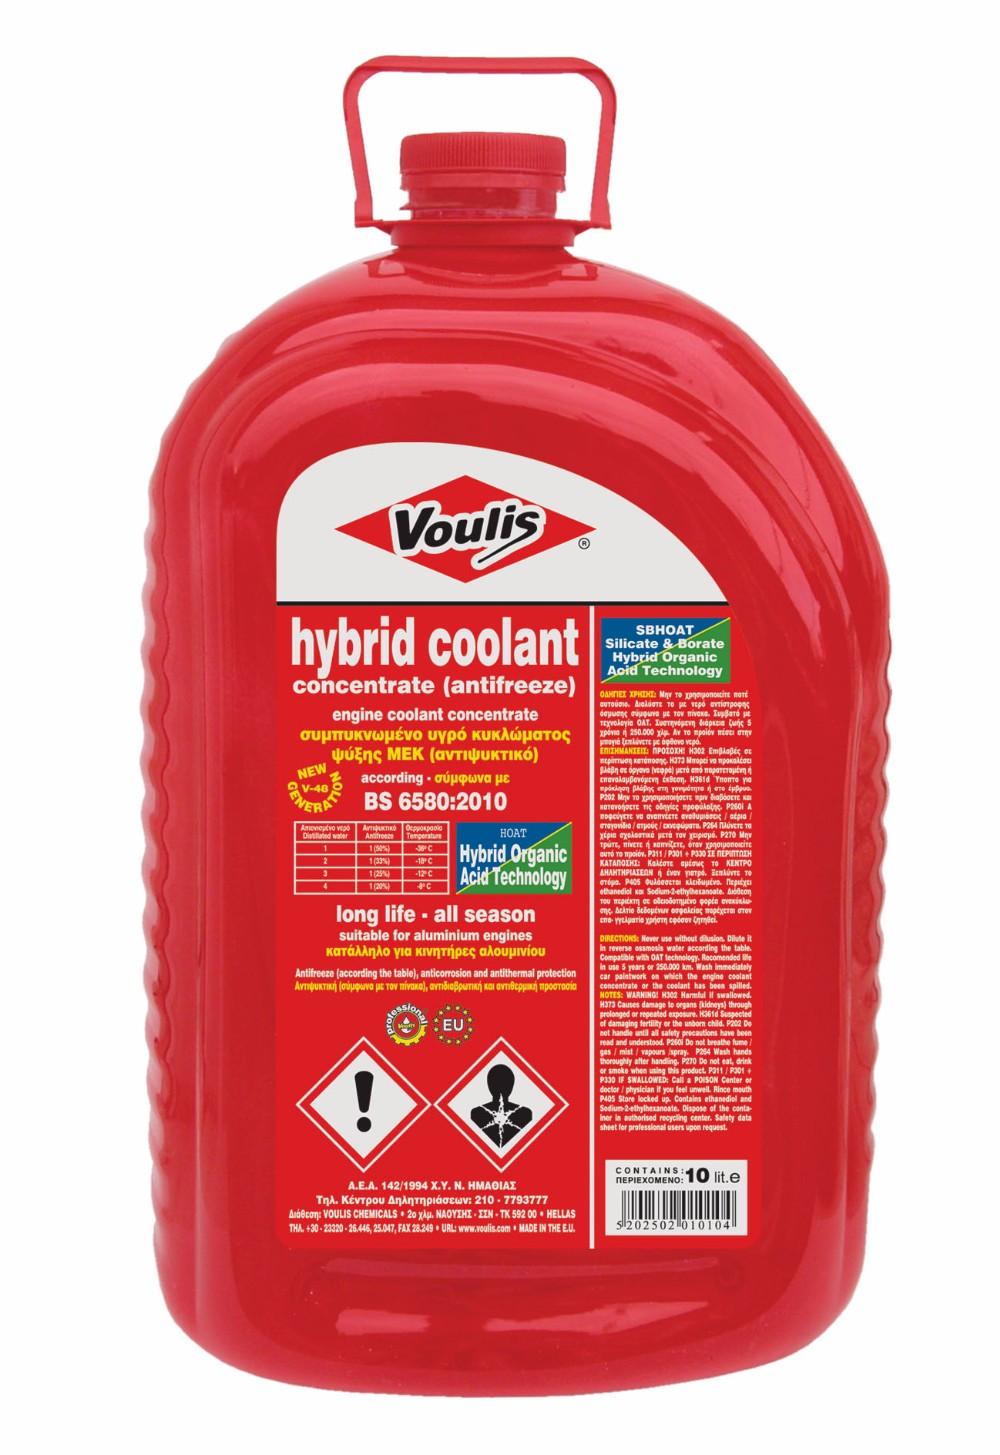 Hybrid Coolant Antifreeze Long Life Sbhoat Silicate And Borate Organic Acid Technology